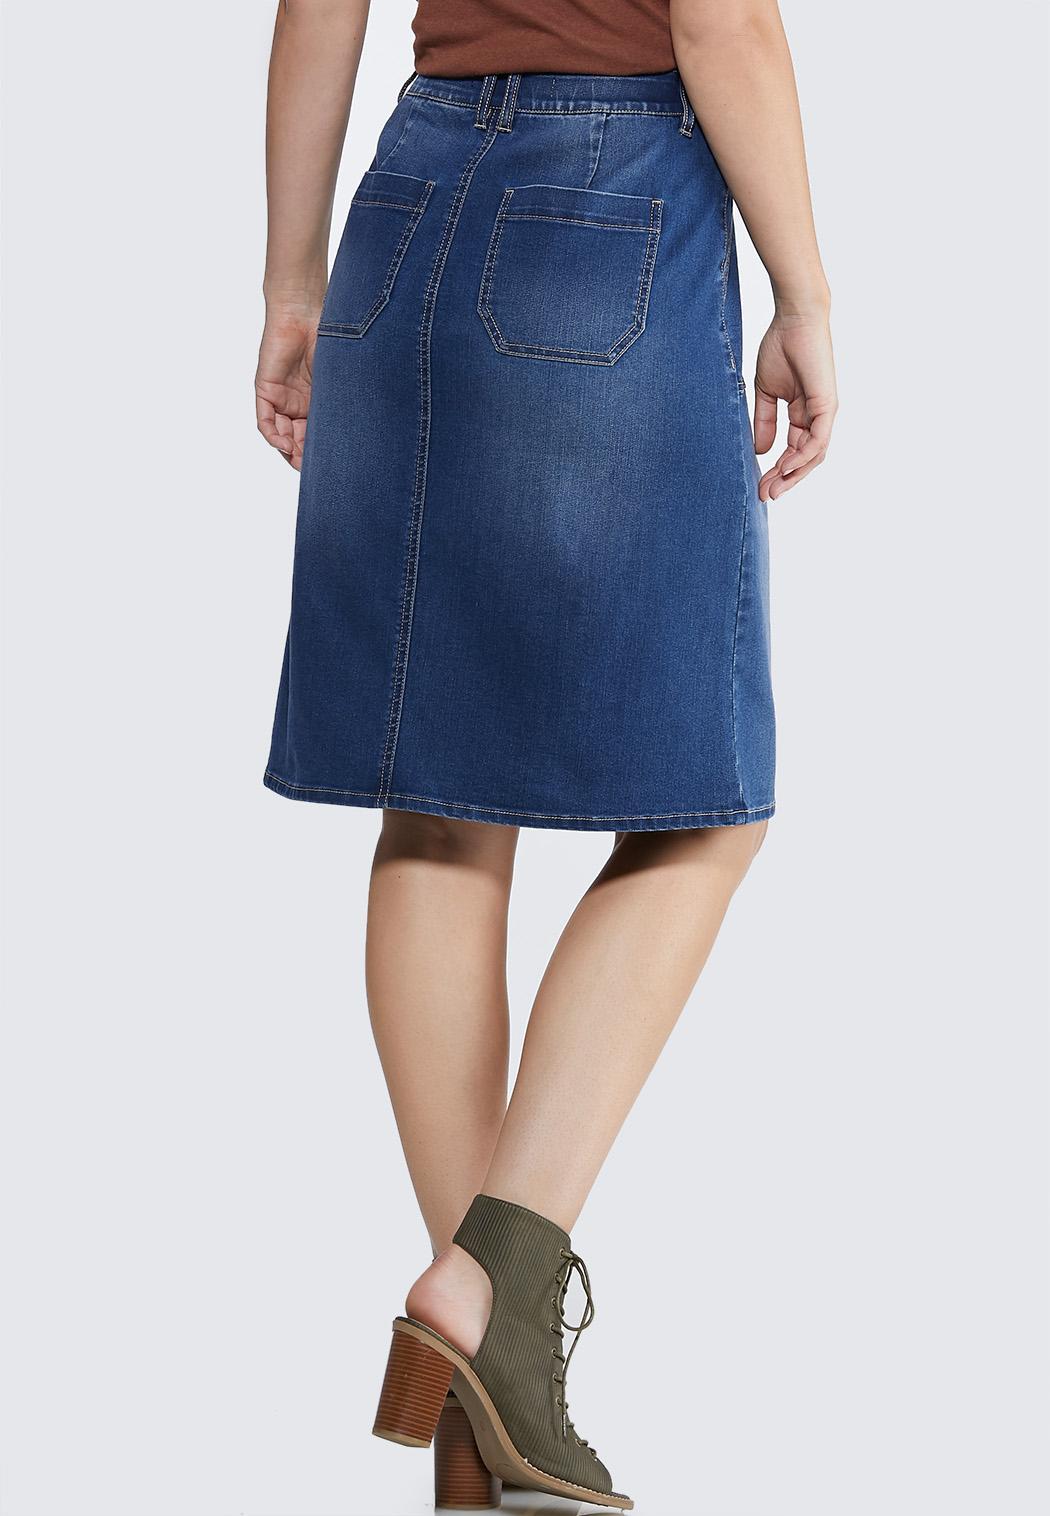 Plus Size Pocket Front Denim Skirt (Item #43950289)